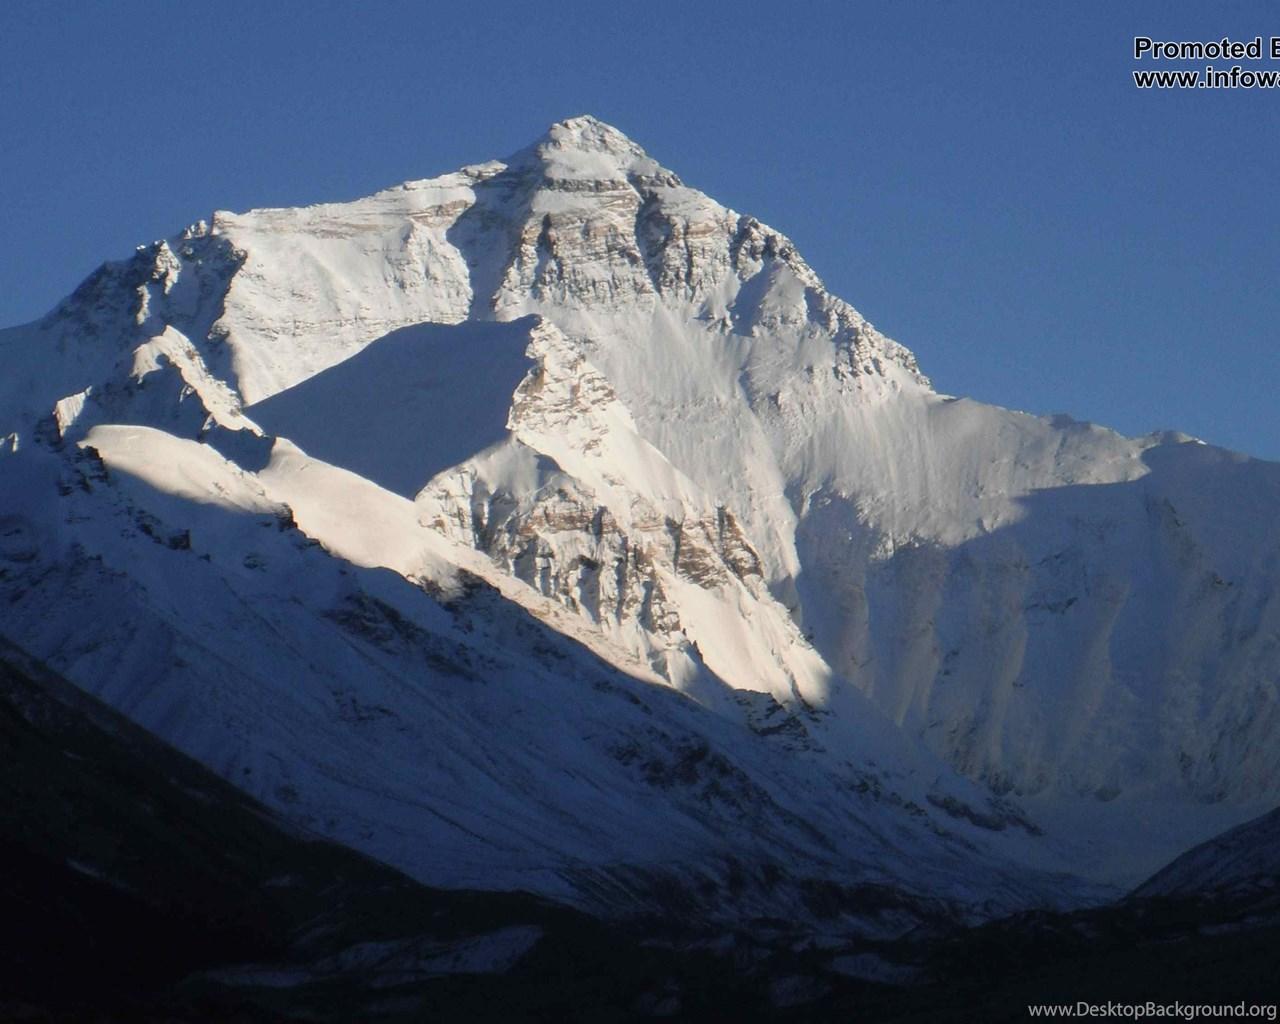 mountain everest wallpapers photo 141 of 172 desktop